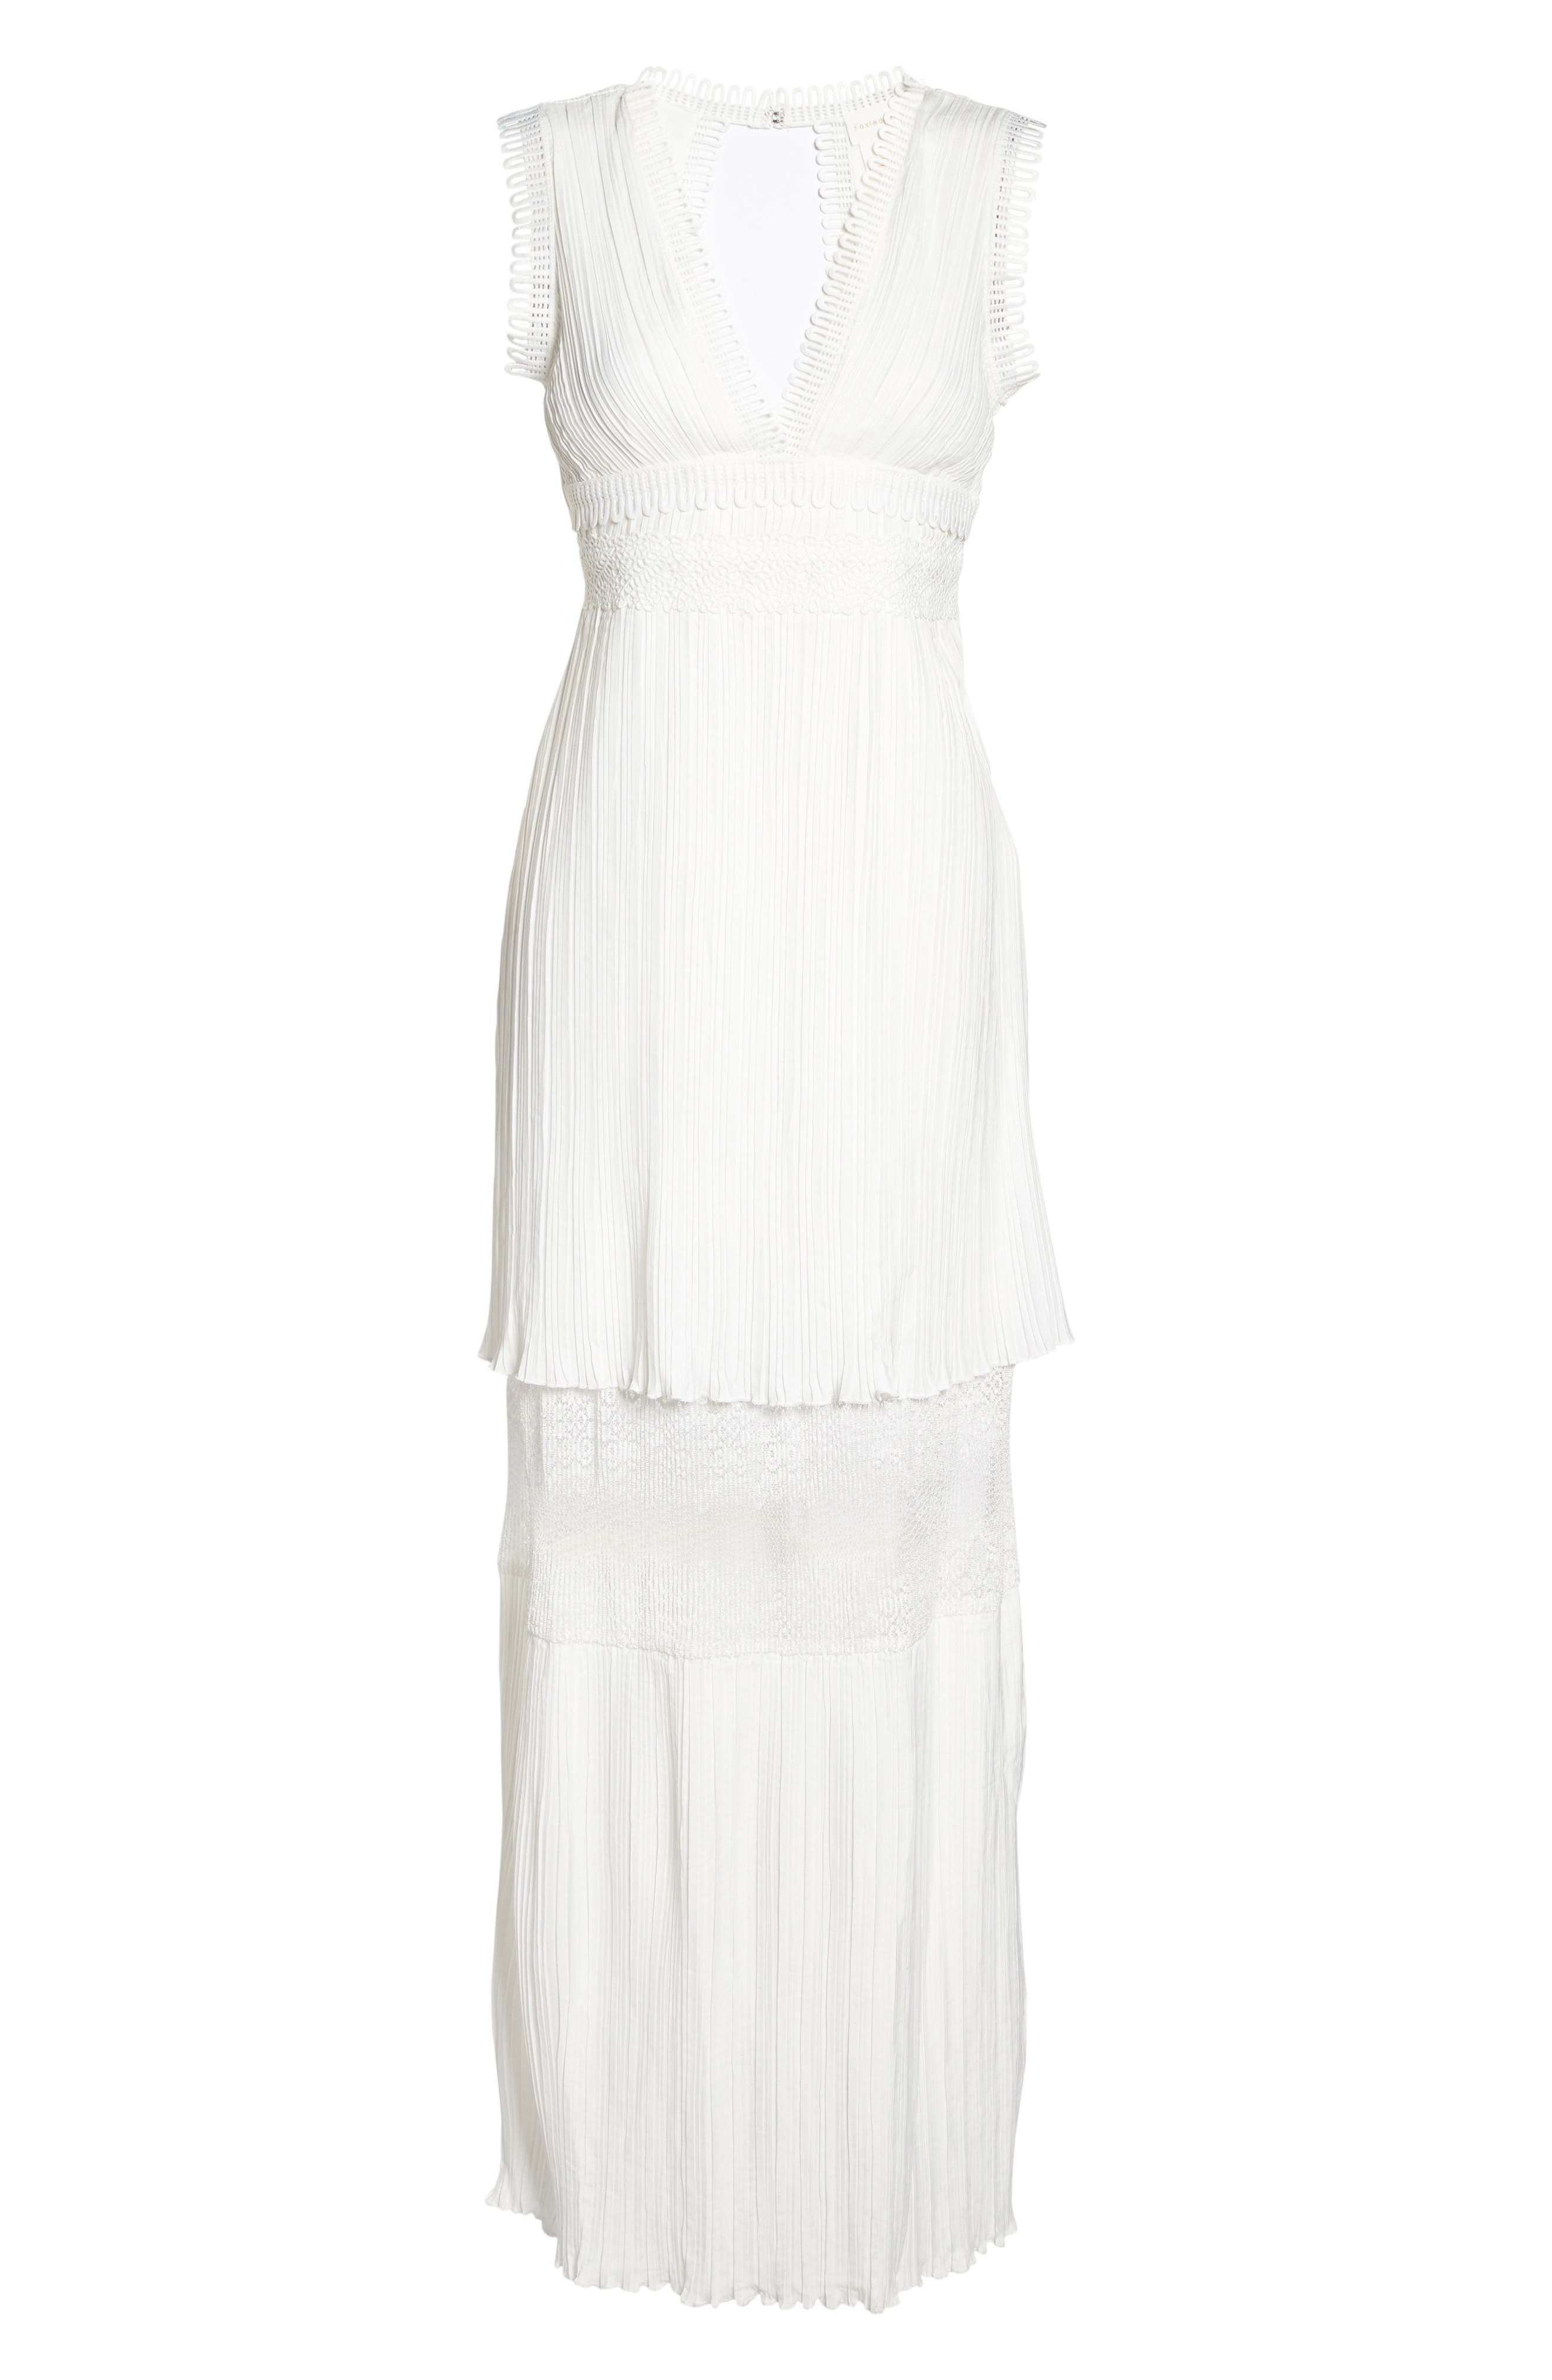 Jasmine Lace Inset Pleated Dress,                             Alternate thumbnail 6, color,                             Ivory